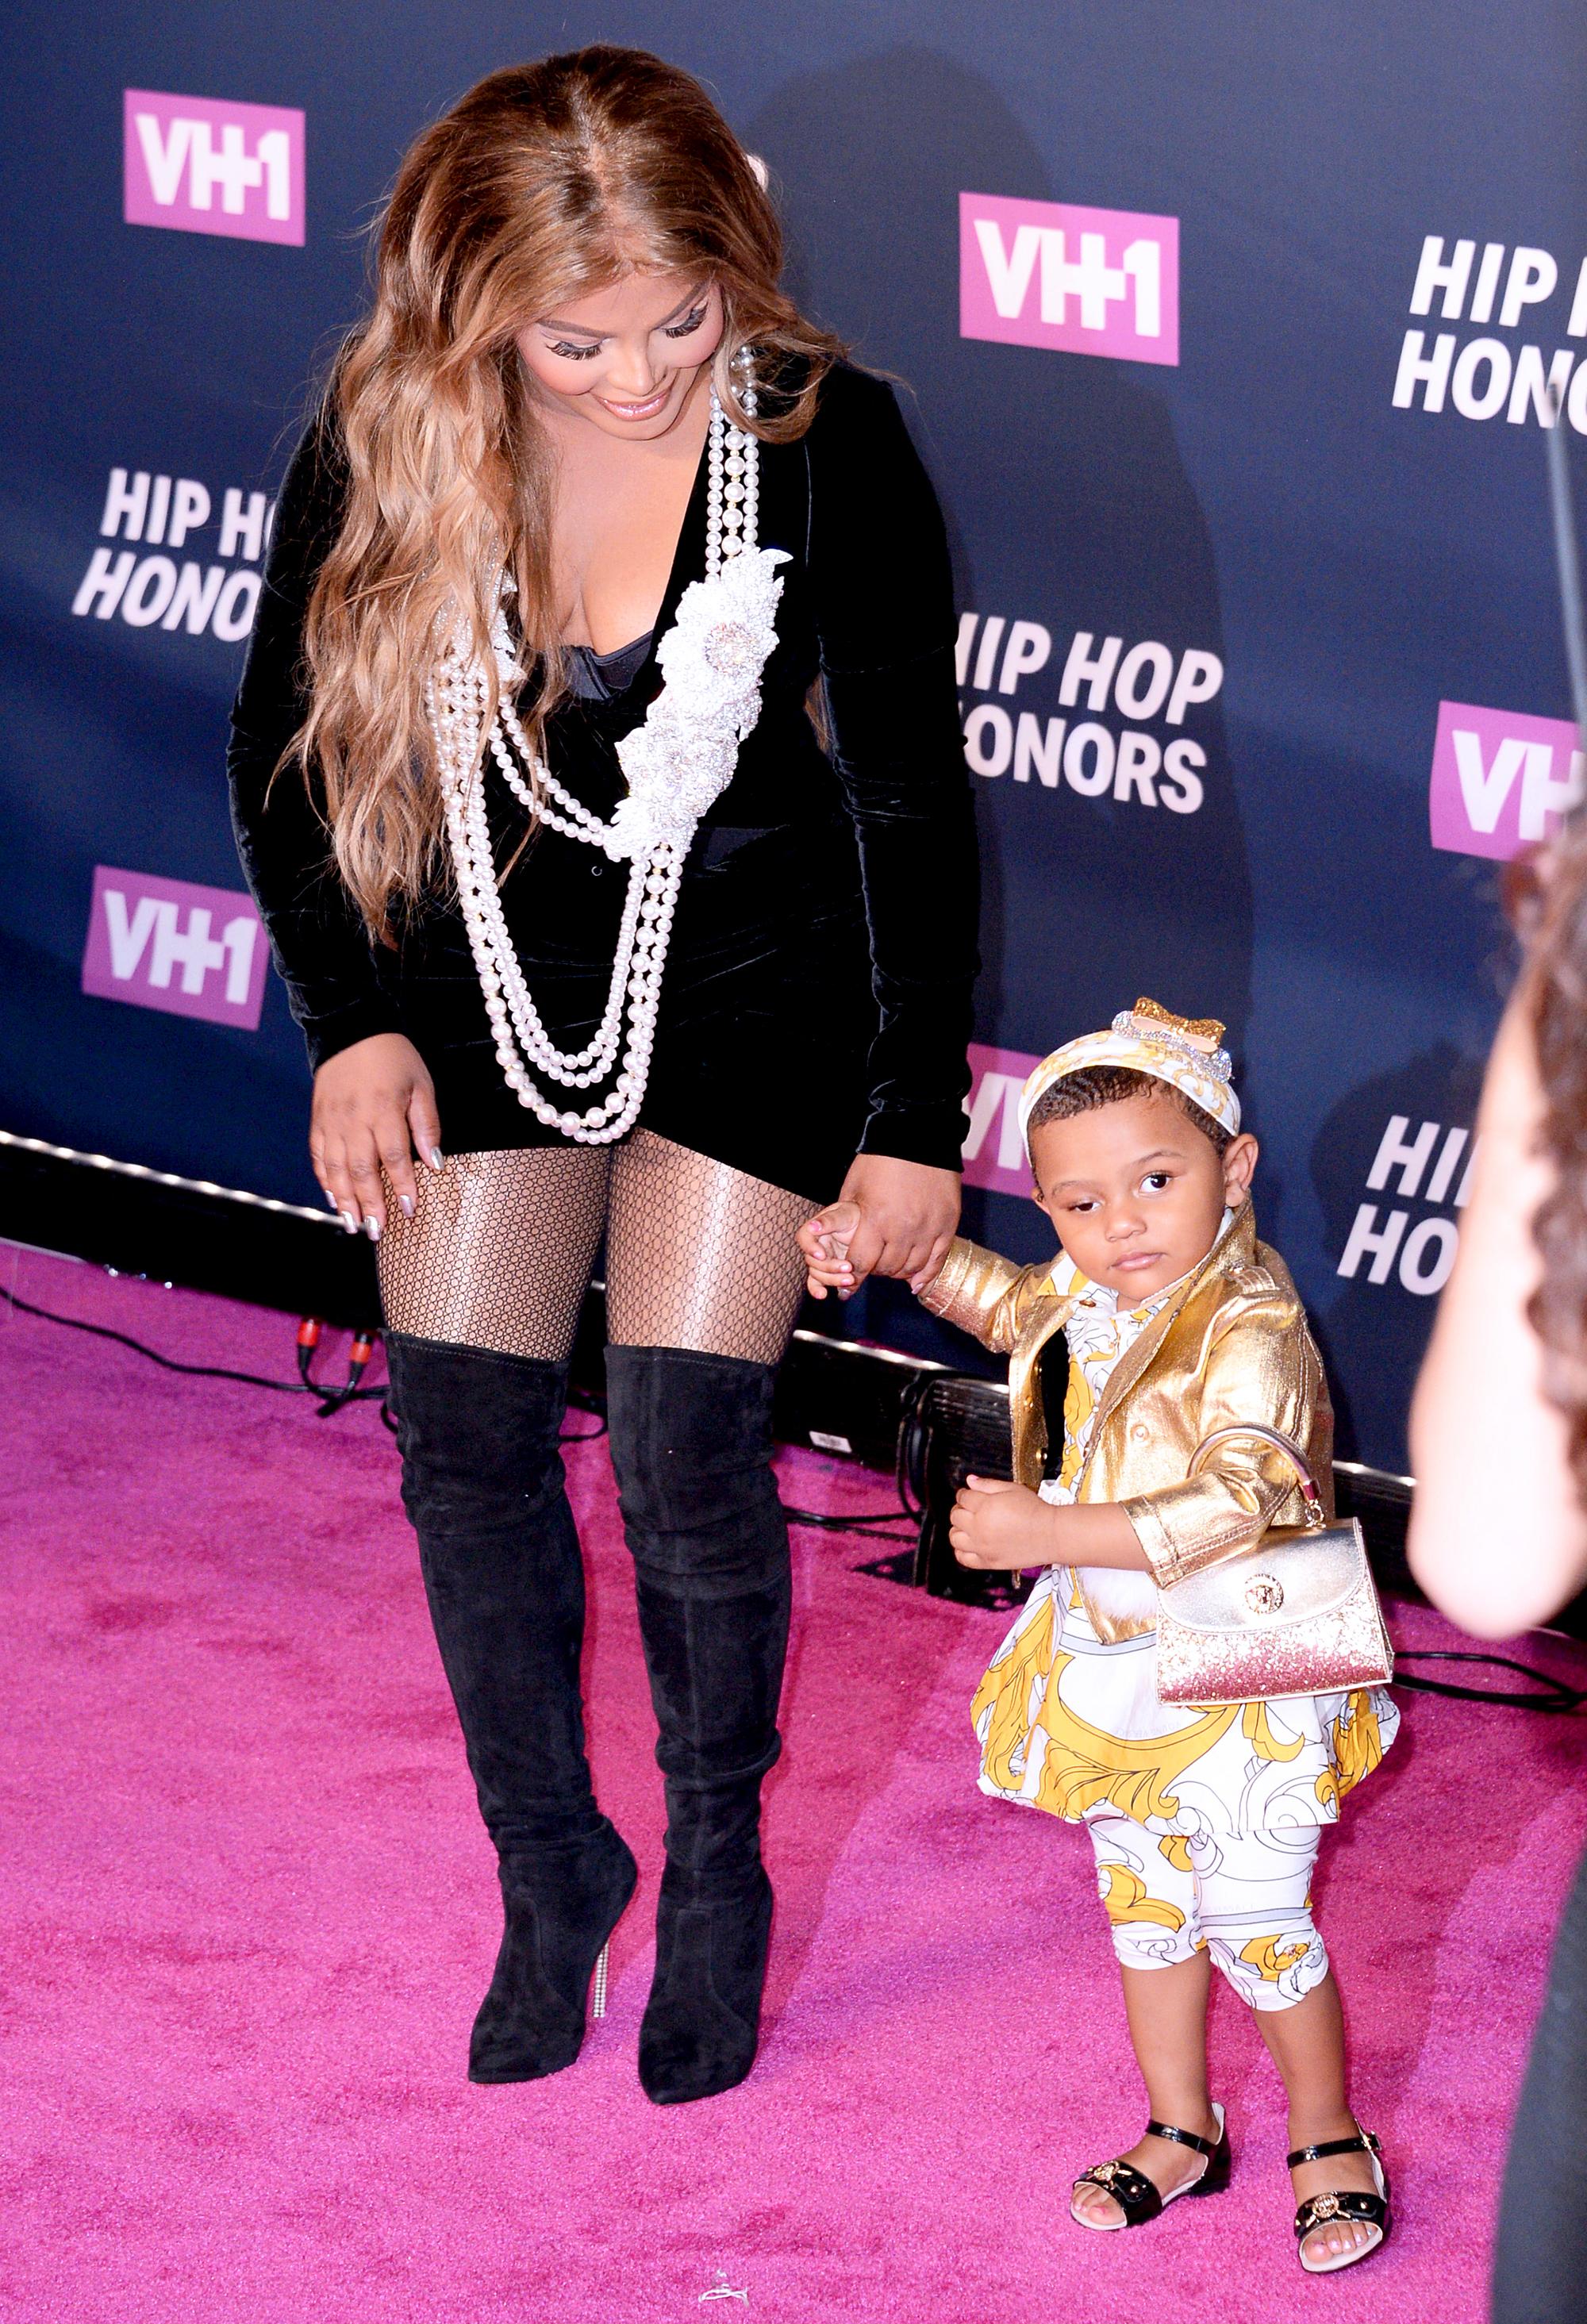 Lil Kim and Royal Reign